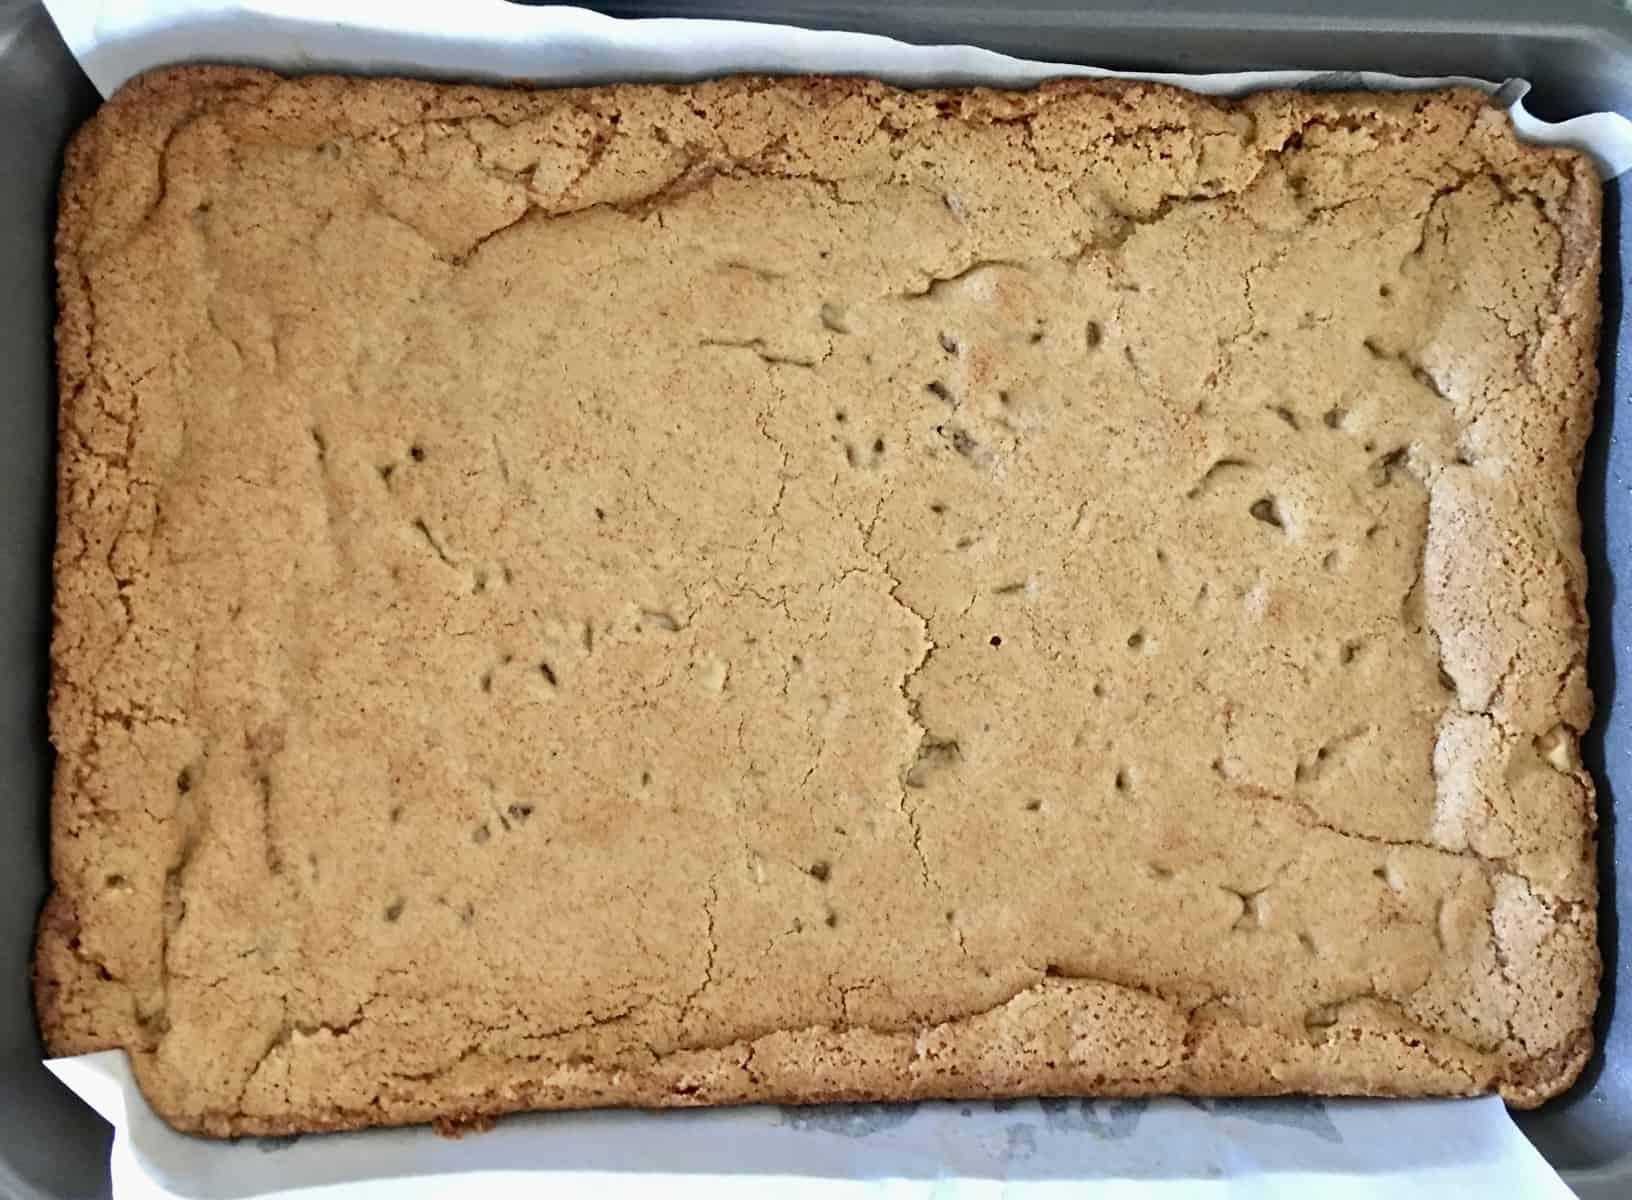 butterscotch blondies in baking pan